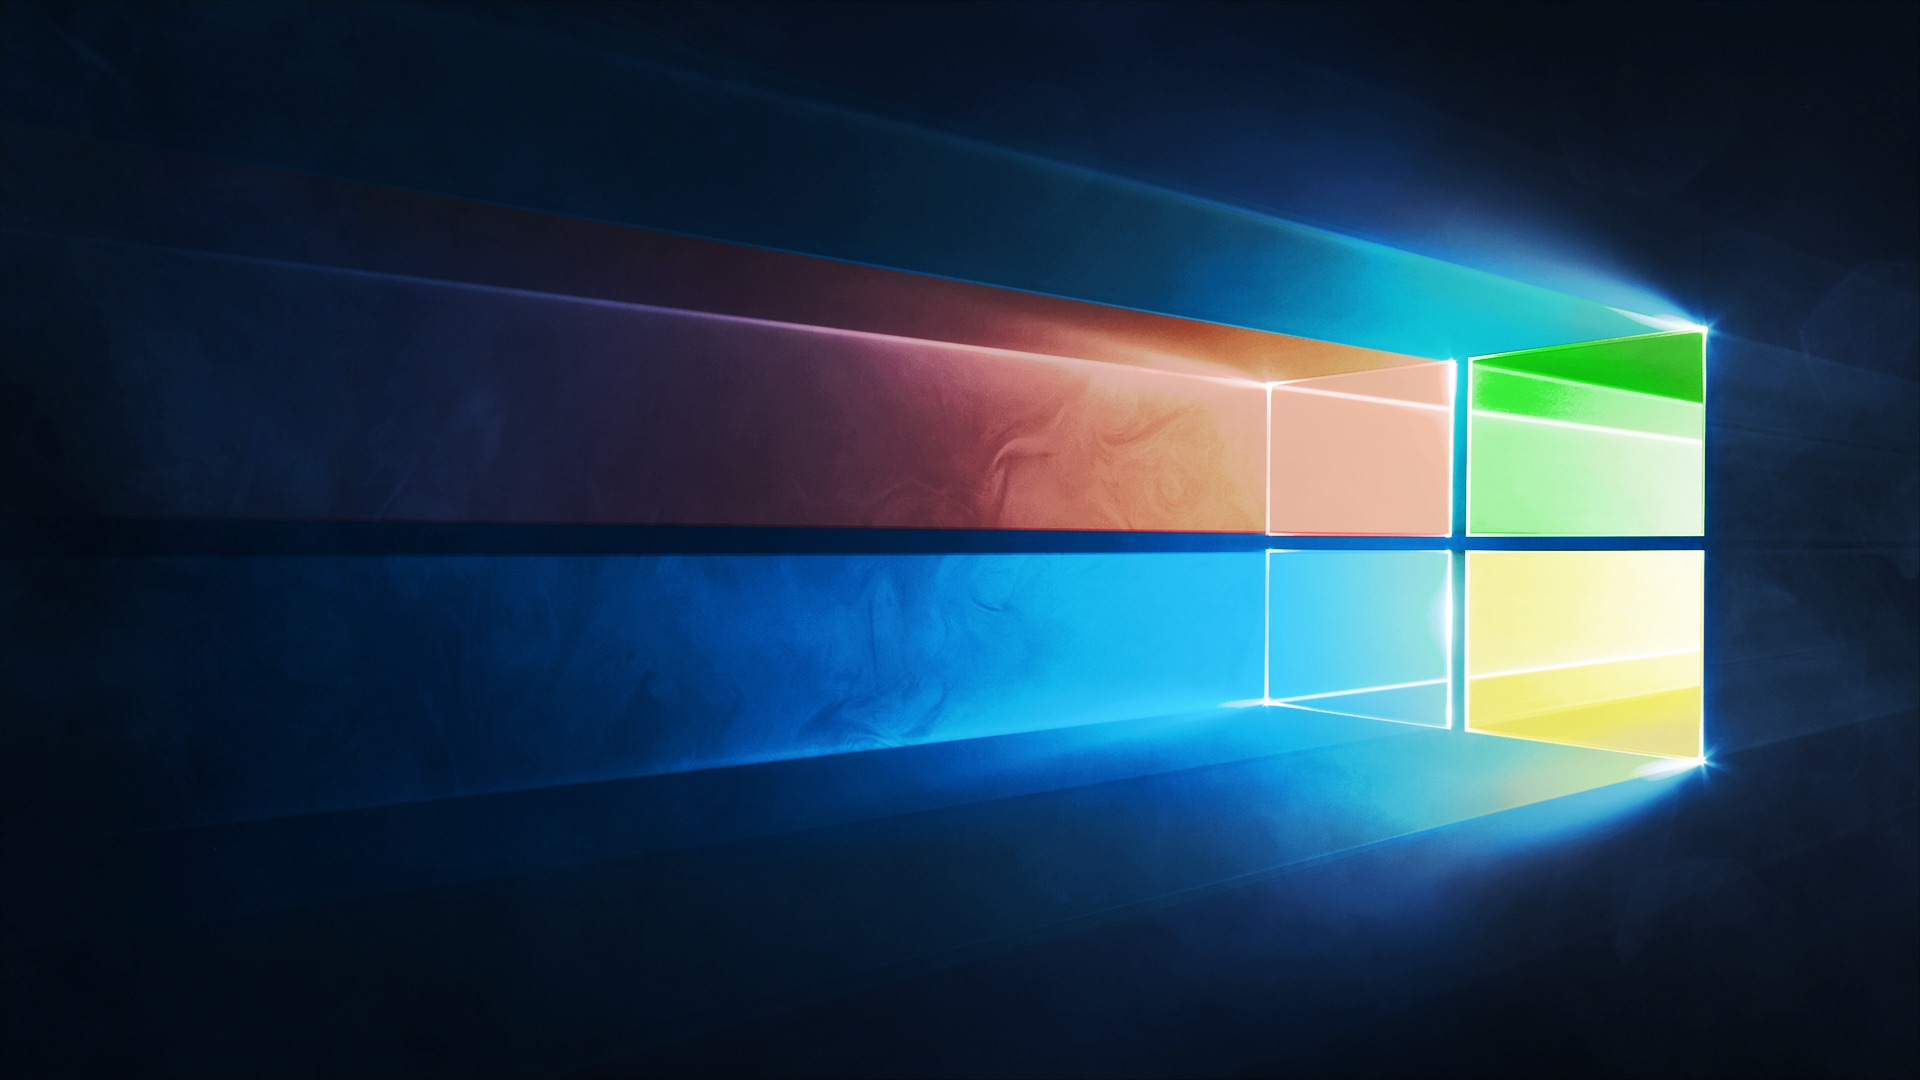 windows vista wallpaper pack free download